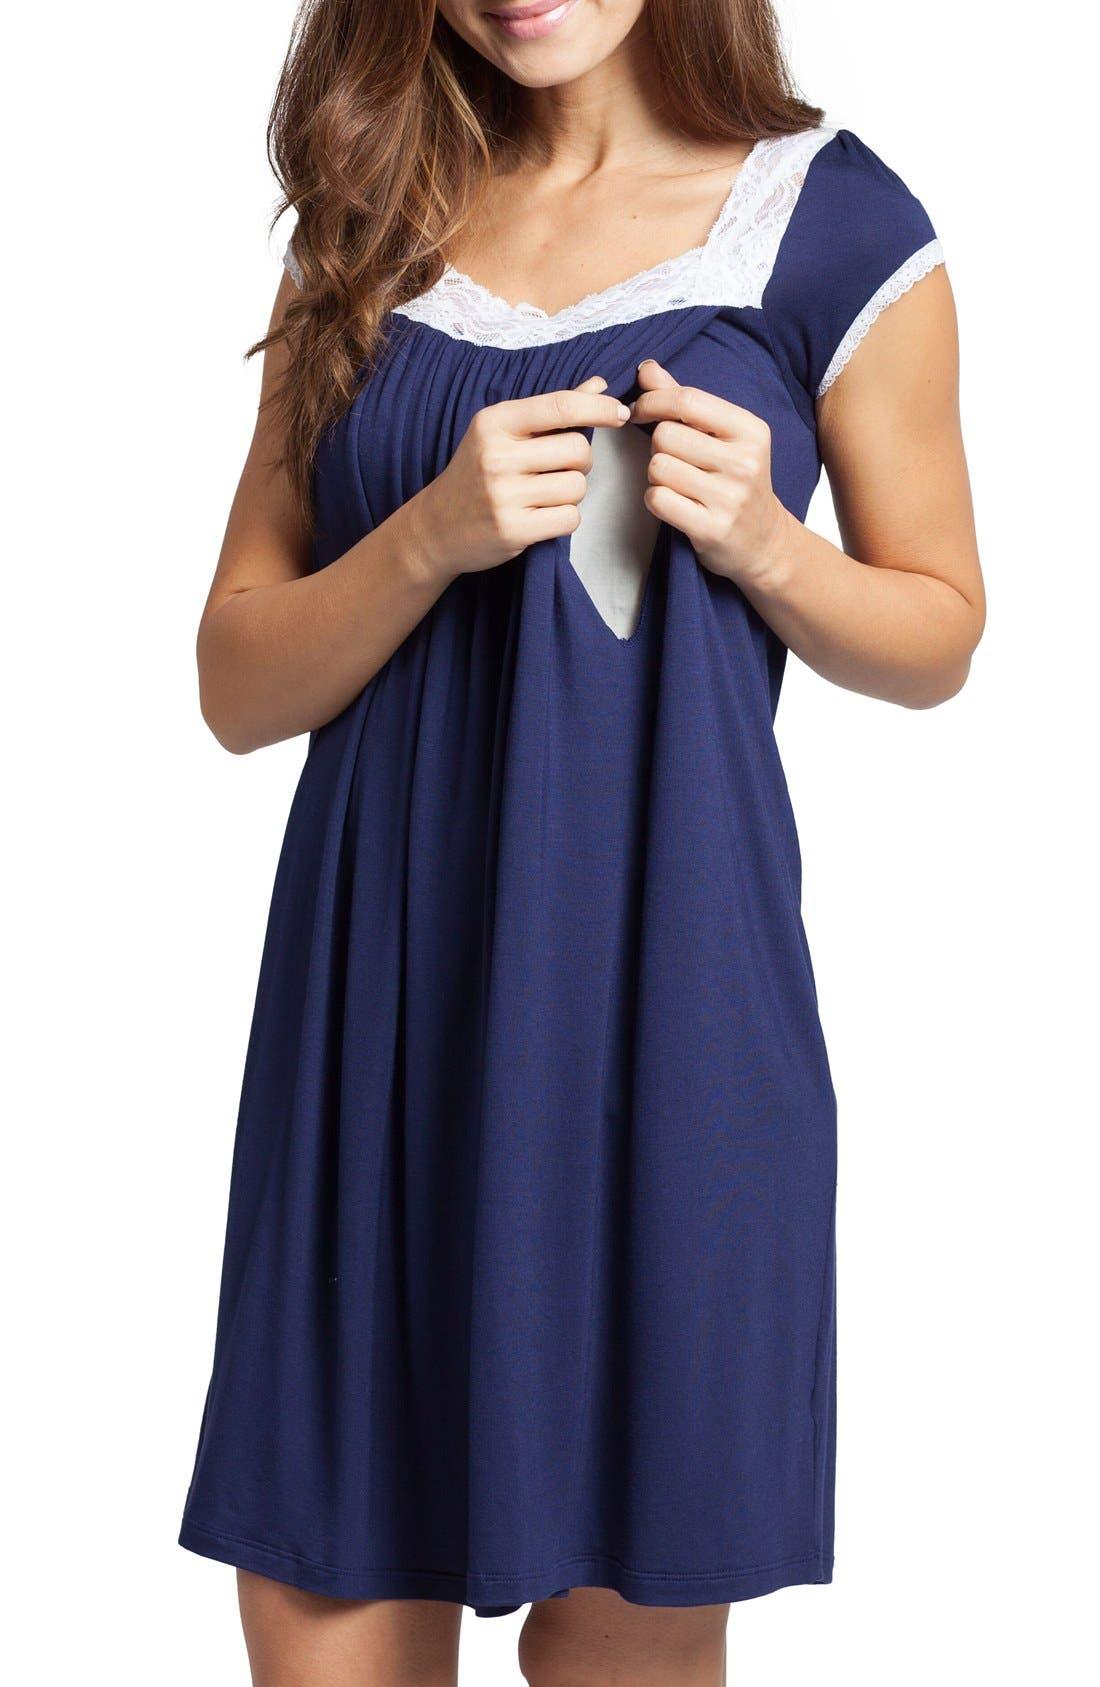 'The Lace' Maternity/Nursing Nightgown,                             Alternate thumbnail 3, color,                             Estate Blue